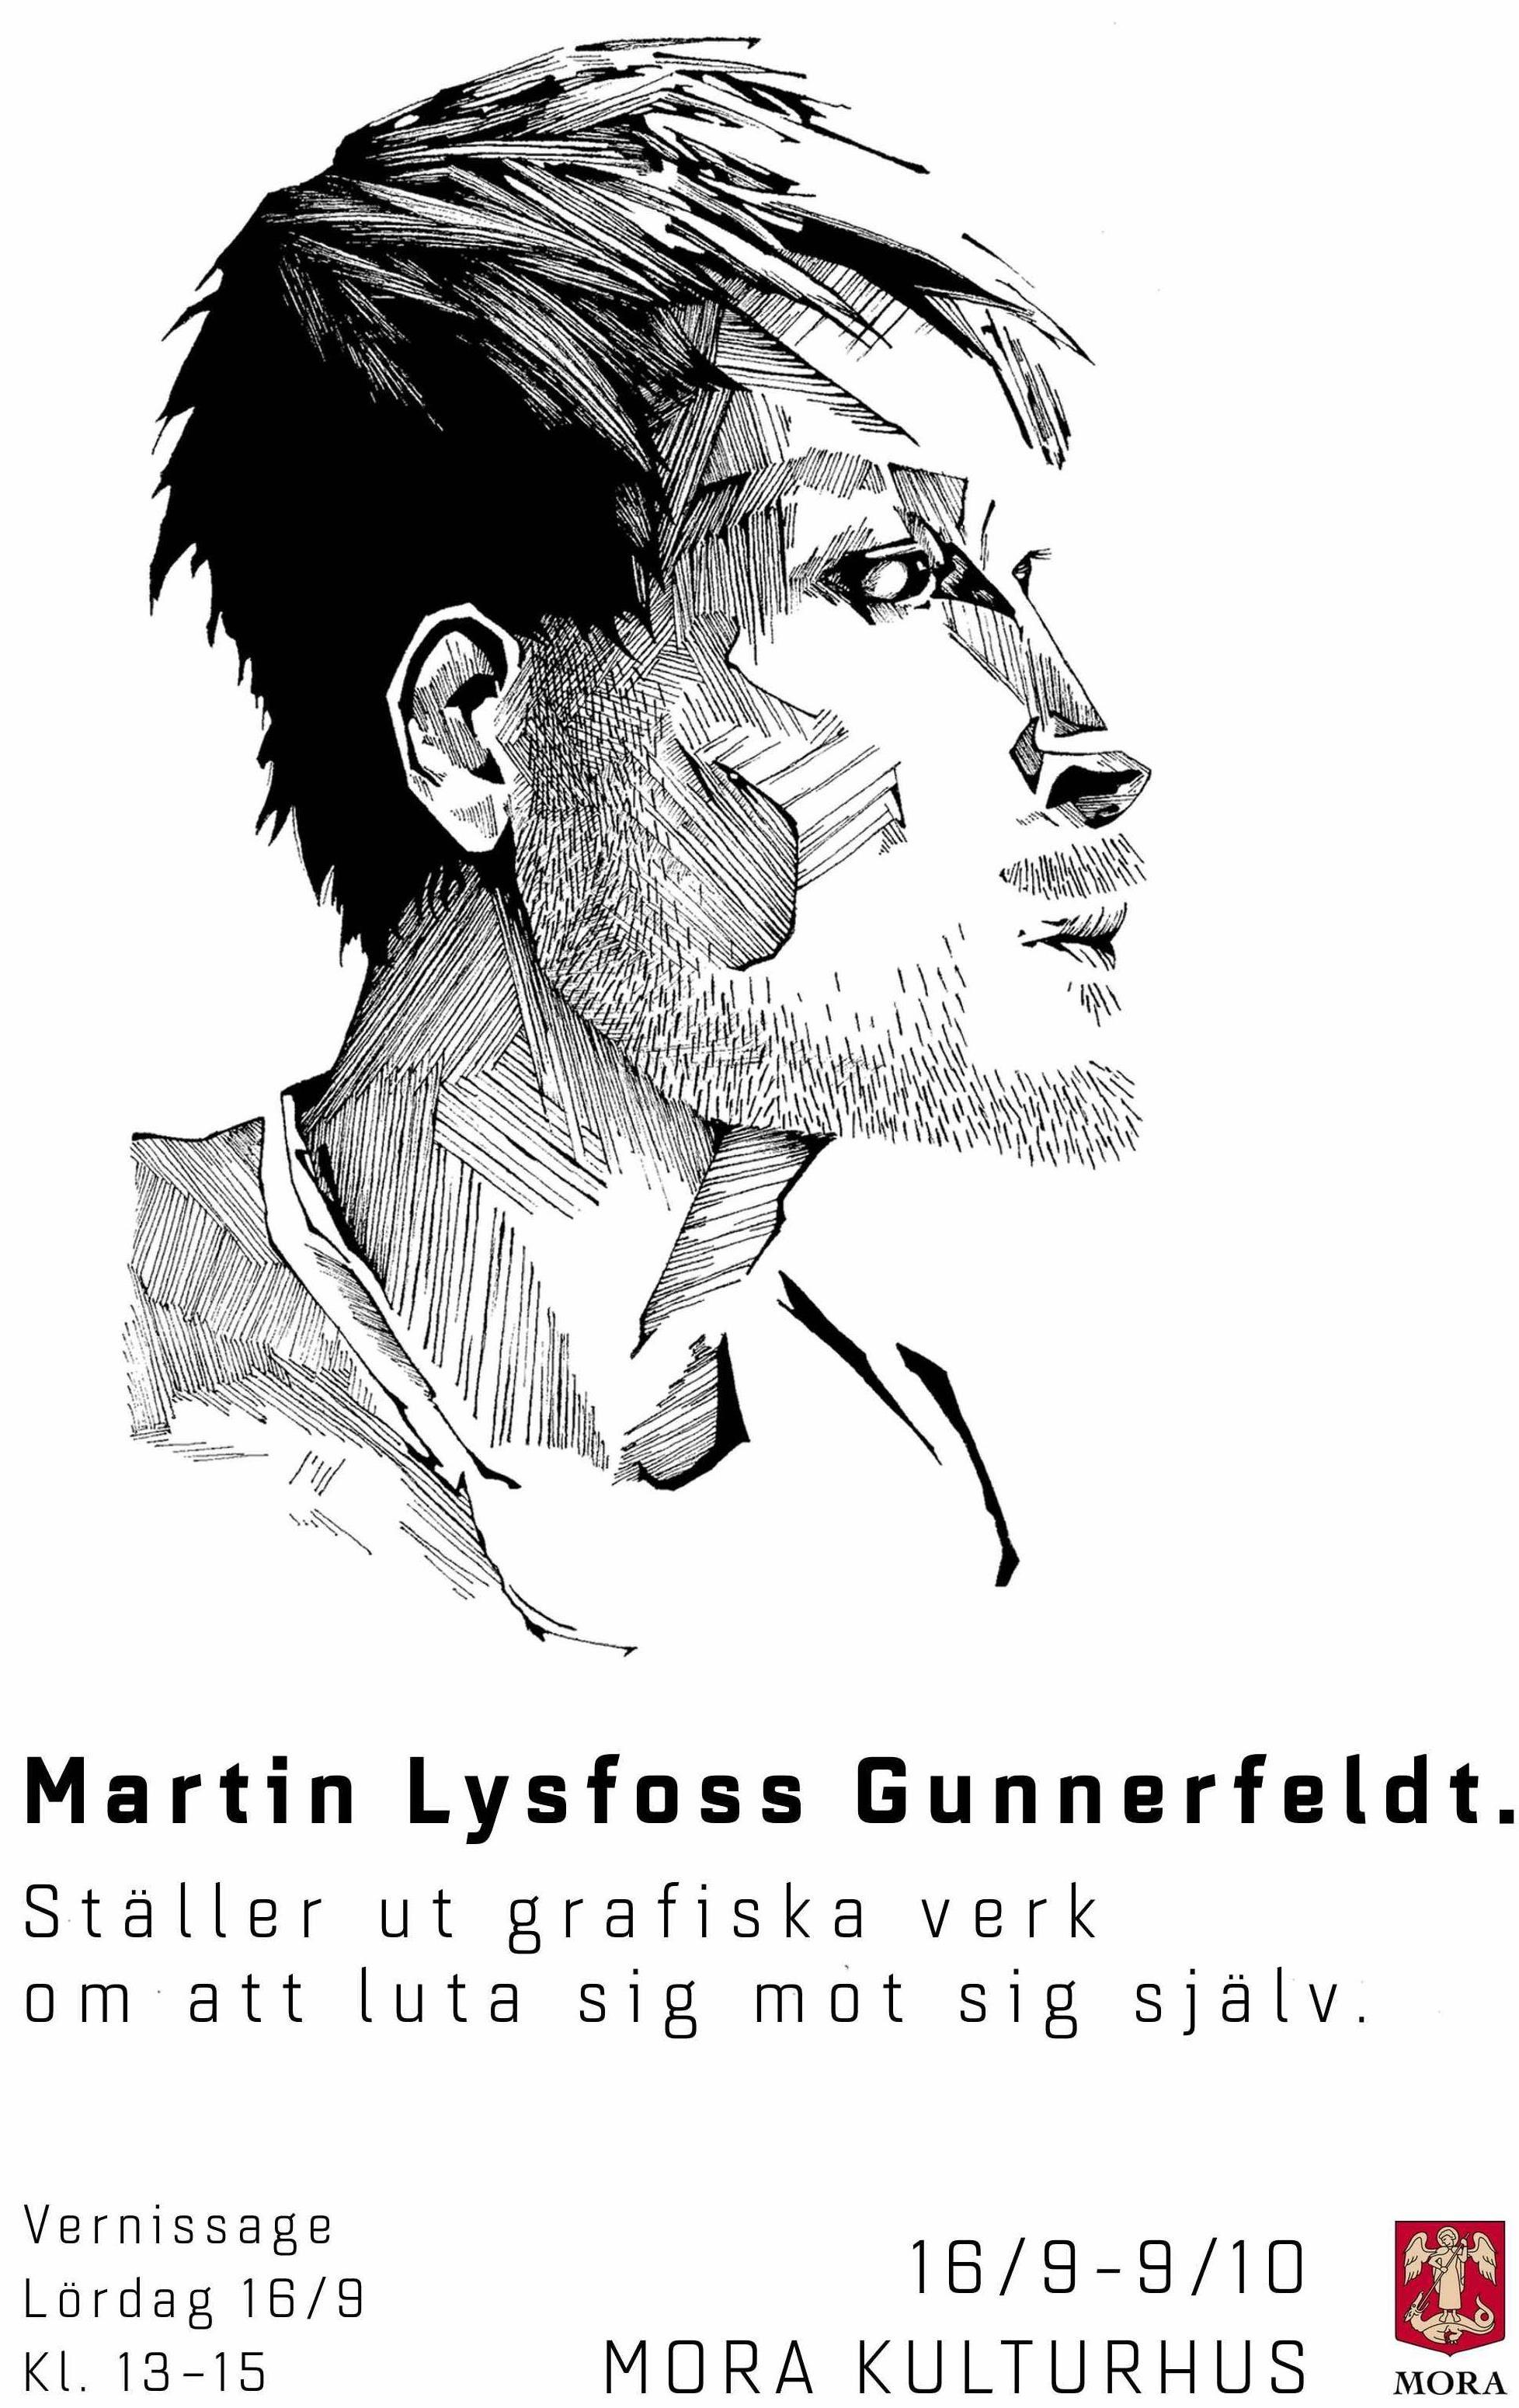 Martin Lysfoss Gunnerfeldt.